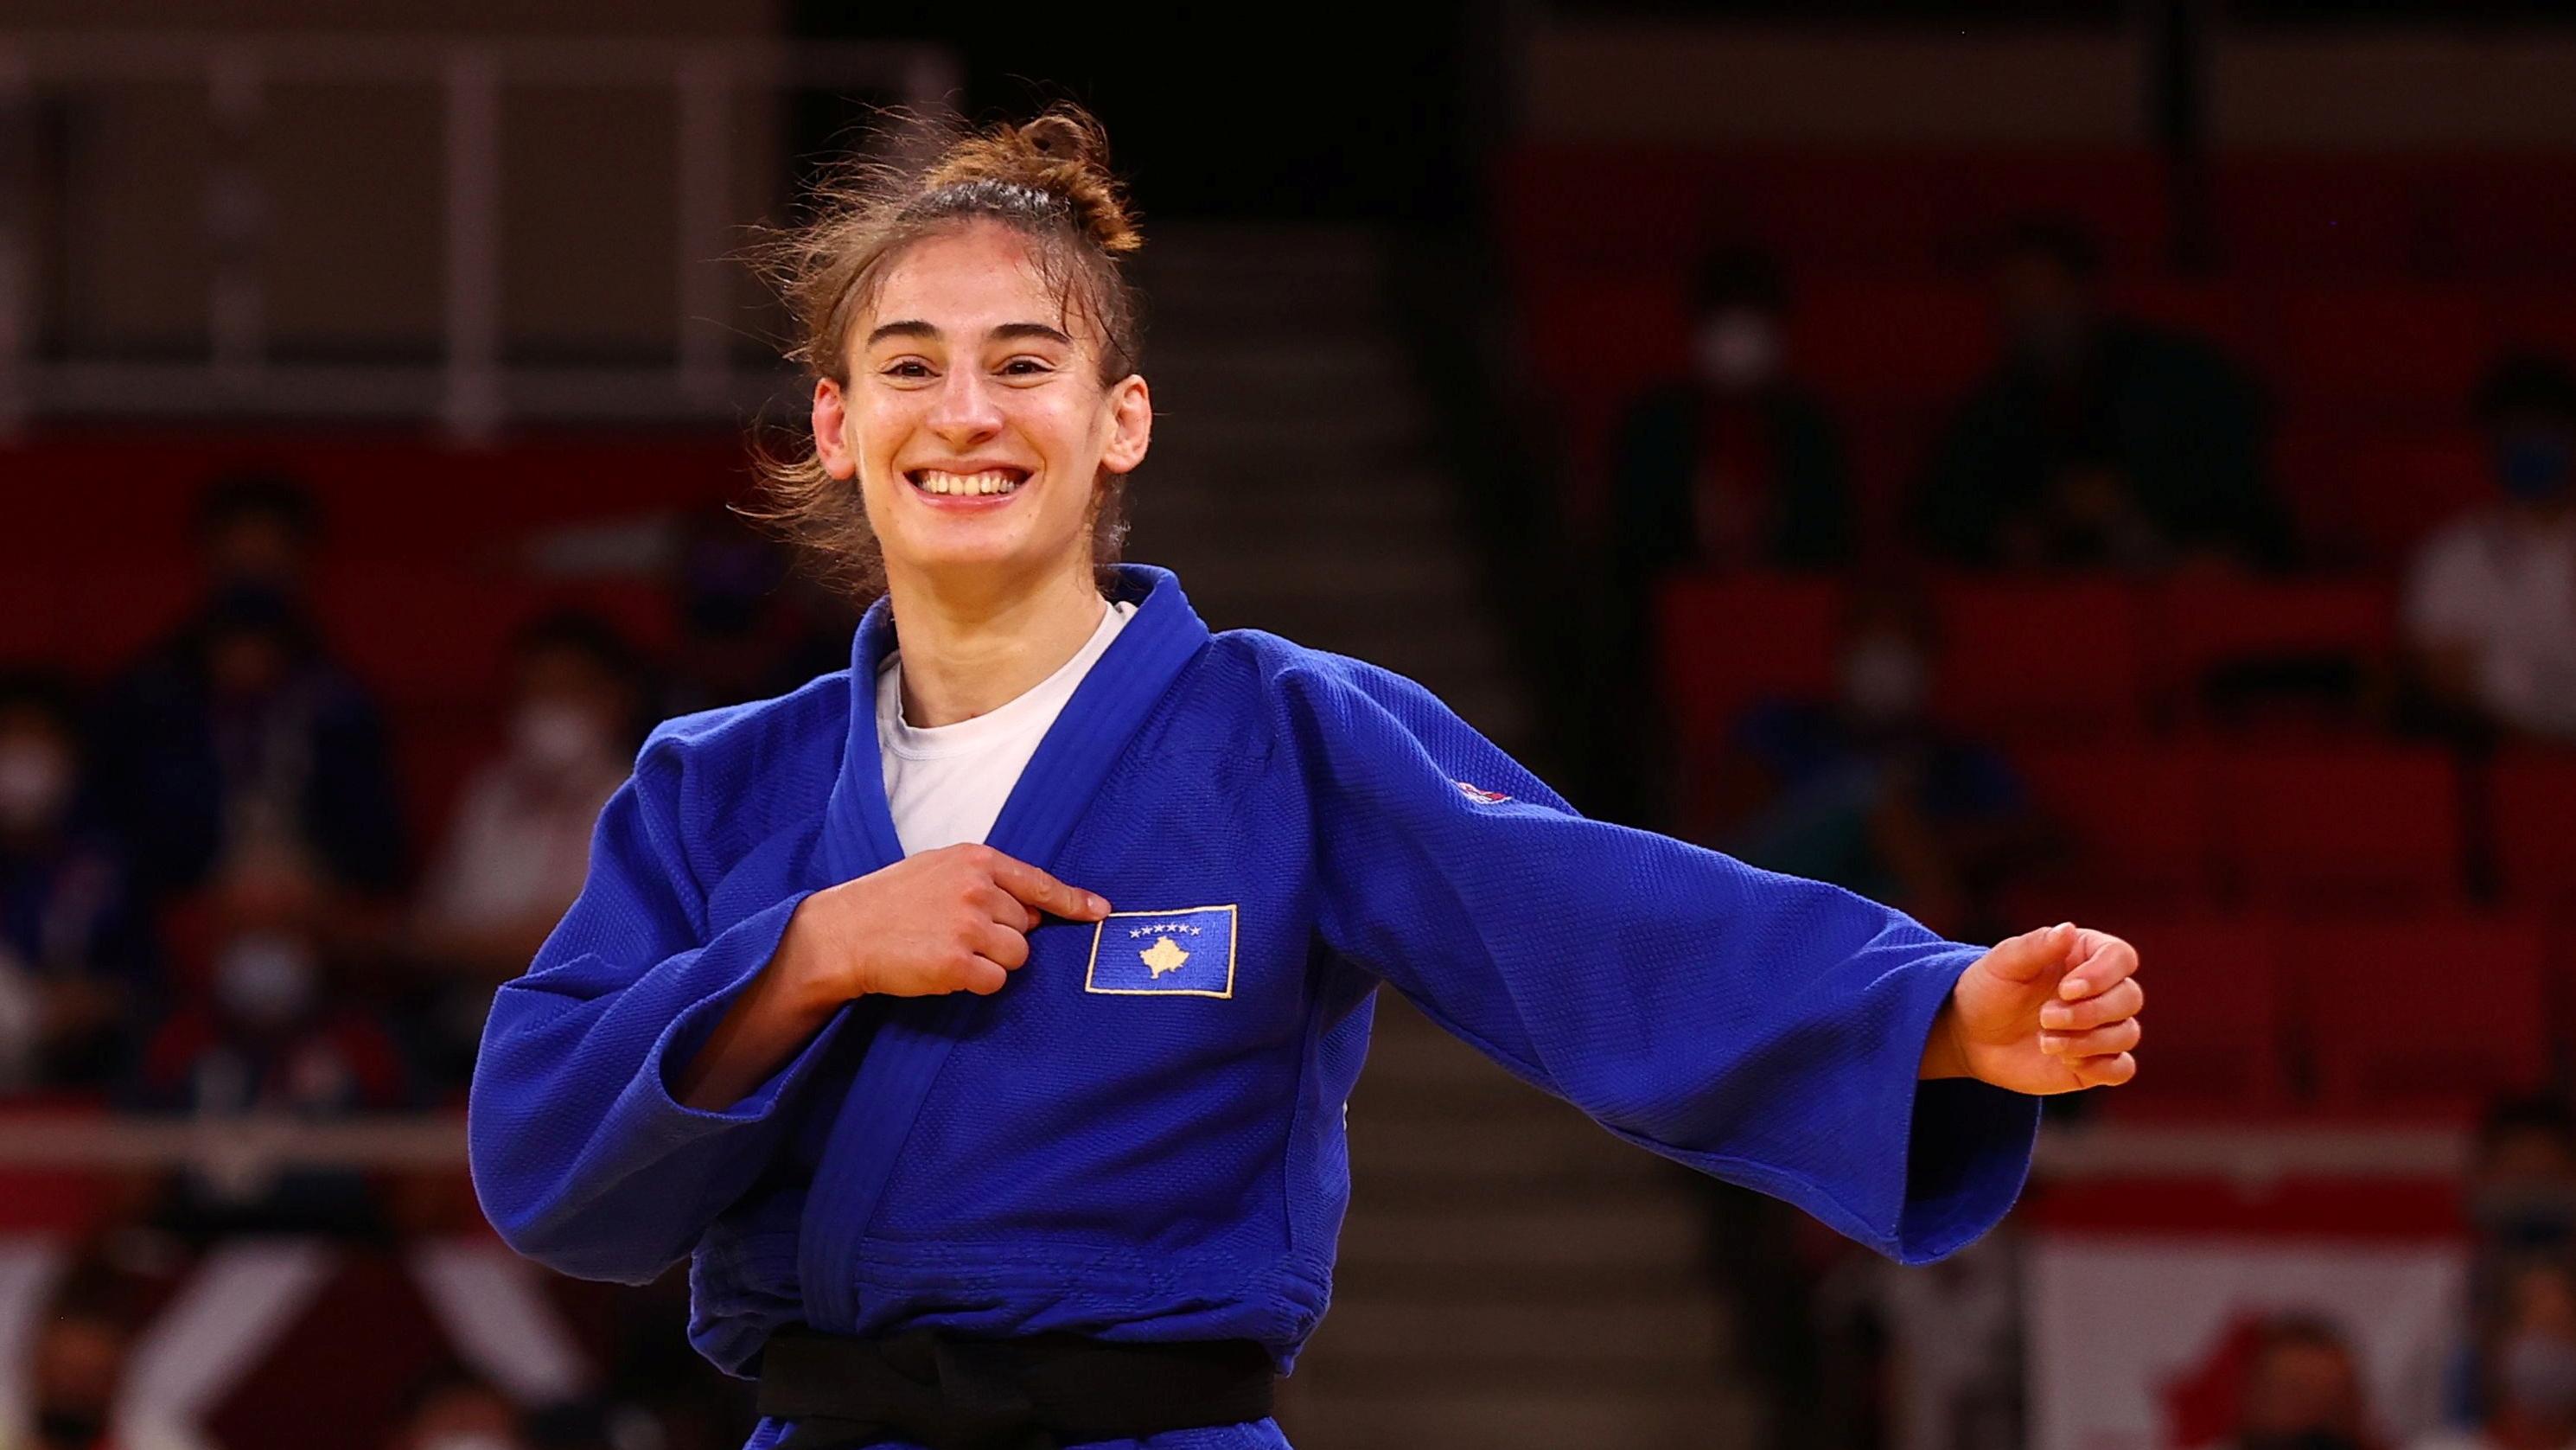 Tokyo 2020 Olympics - Judo - Women's 57kg - Gold medal match - Nippon Budokan - Tokyo, Japan - July 26, 2021. Nora Gjakova of Kosovo celebrates after winning gold REUTERS/Sergio Perez